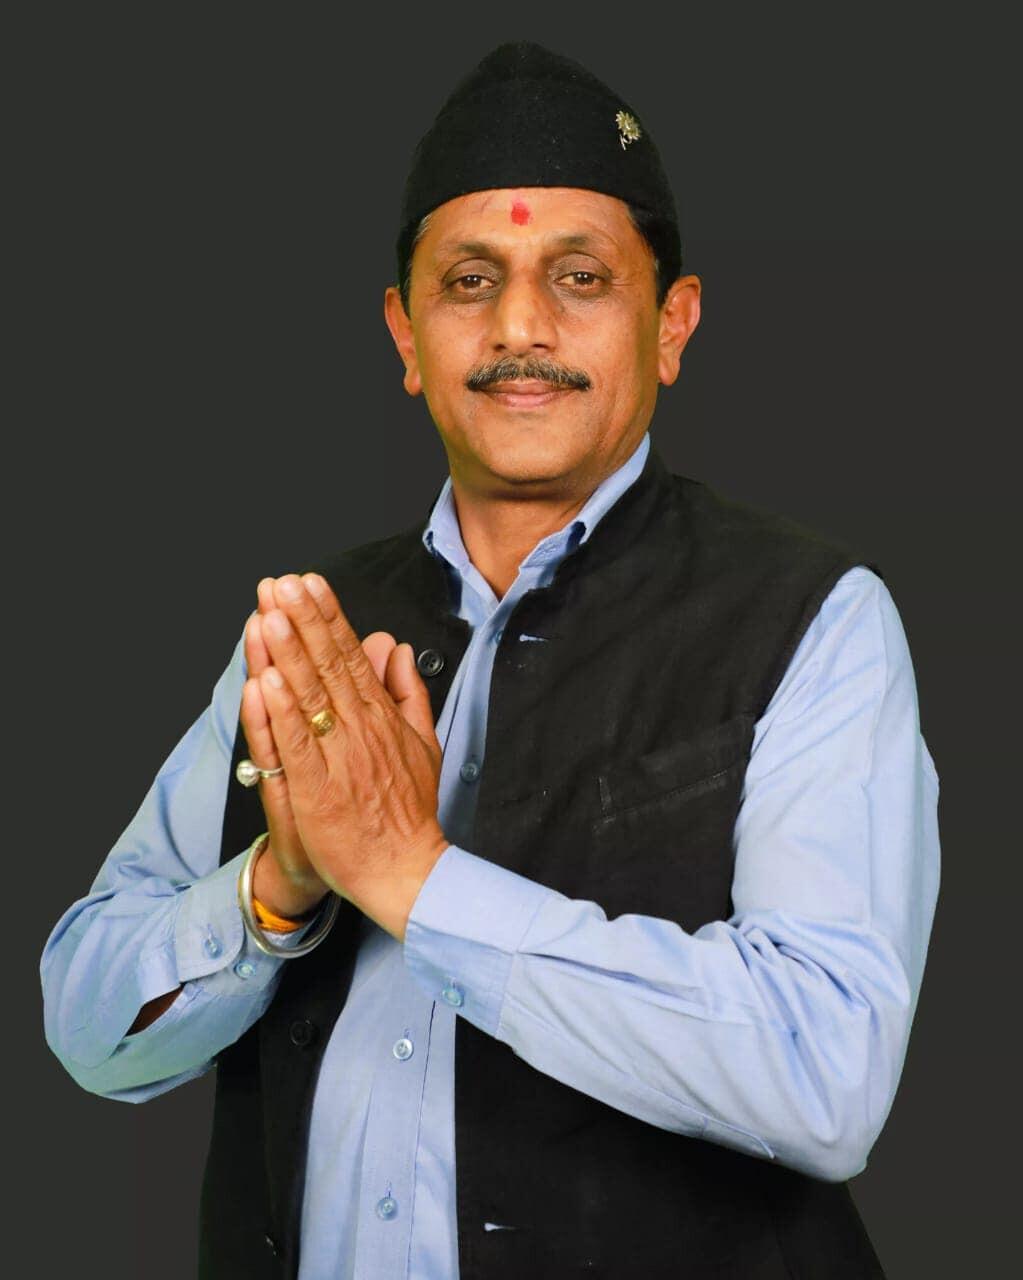 भाजपा किसान मोर्चा के प्रदेश उपाध्यक्ष जोगेन्द्र सिंह पुंडीर ने की कोरोना महामारी से बचाव की अपील